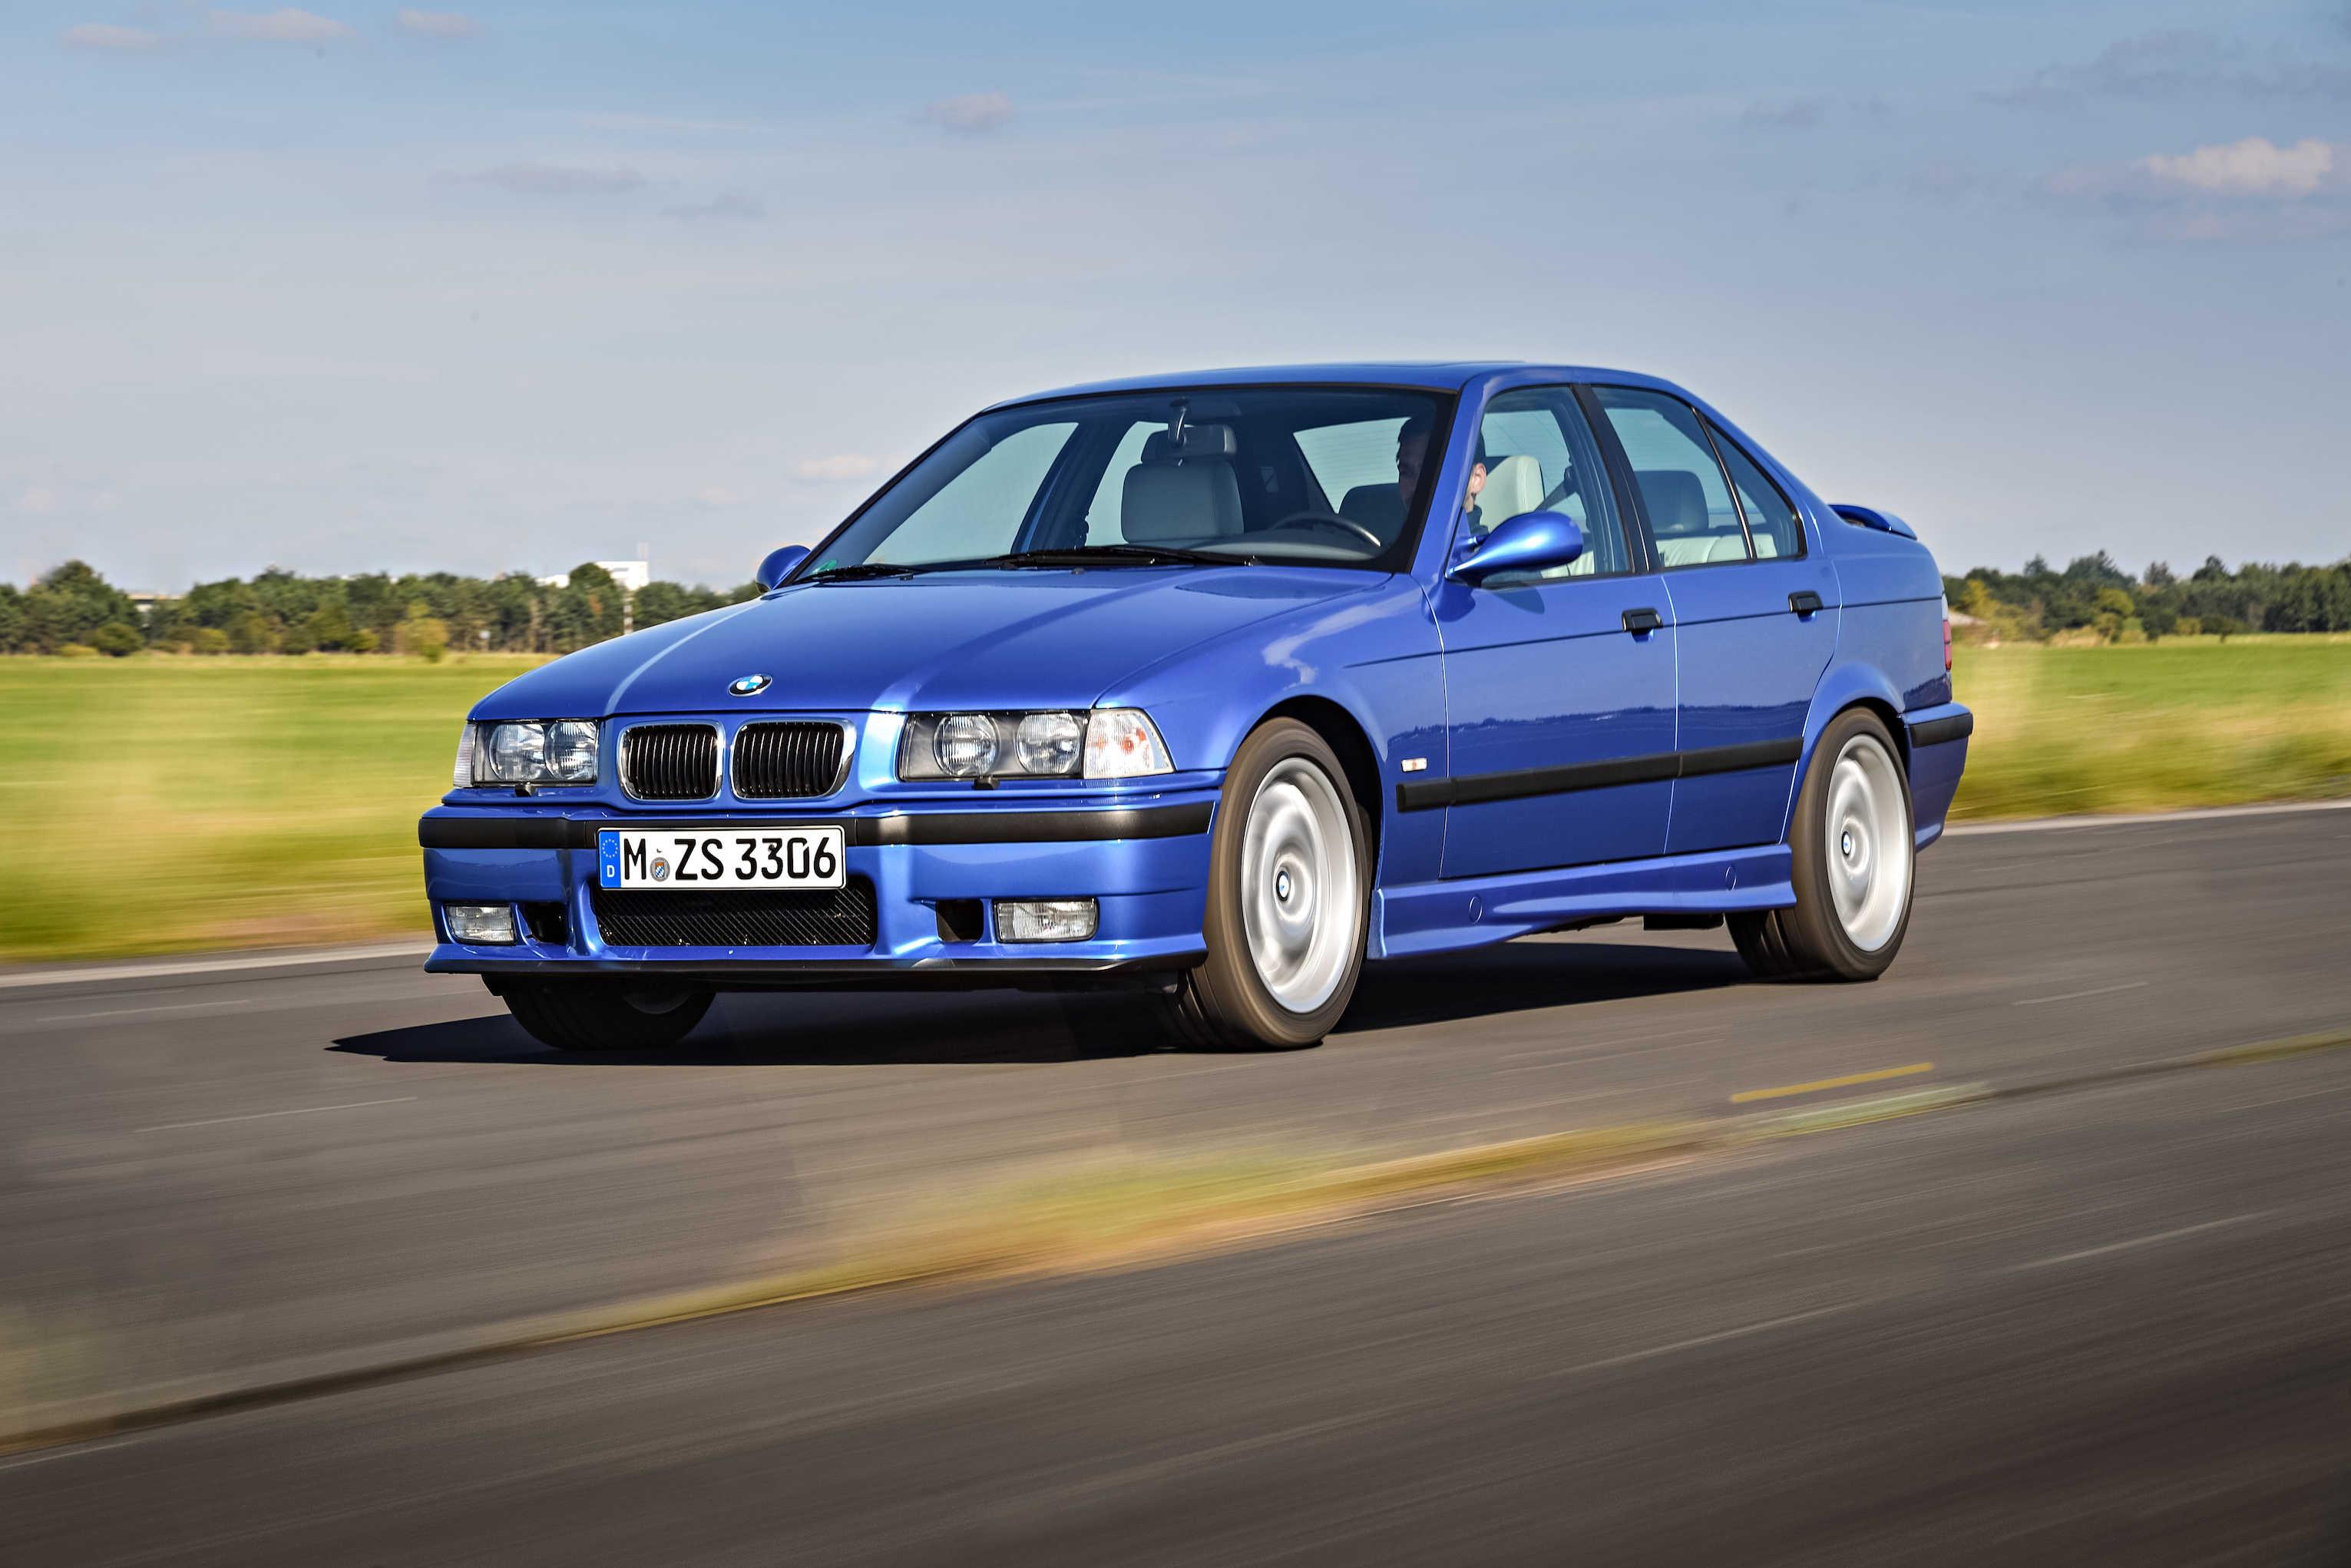 BMW M3 II (E36) 1992 - 1999 Sedan #2